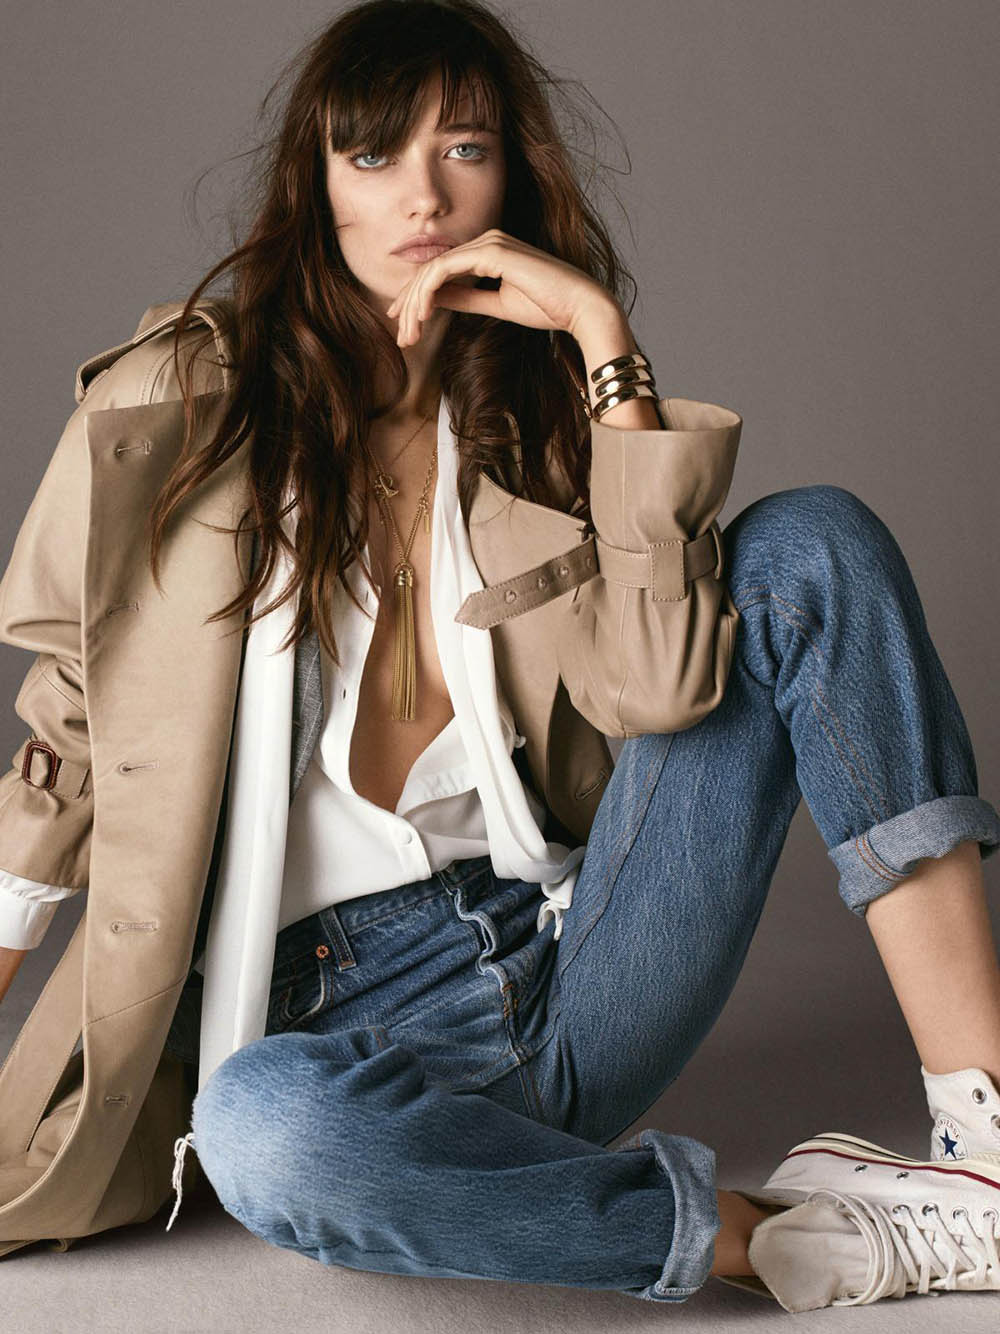 ''Affaire de Styles'' by Christian MacDonald for Vogue Paris September 2019